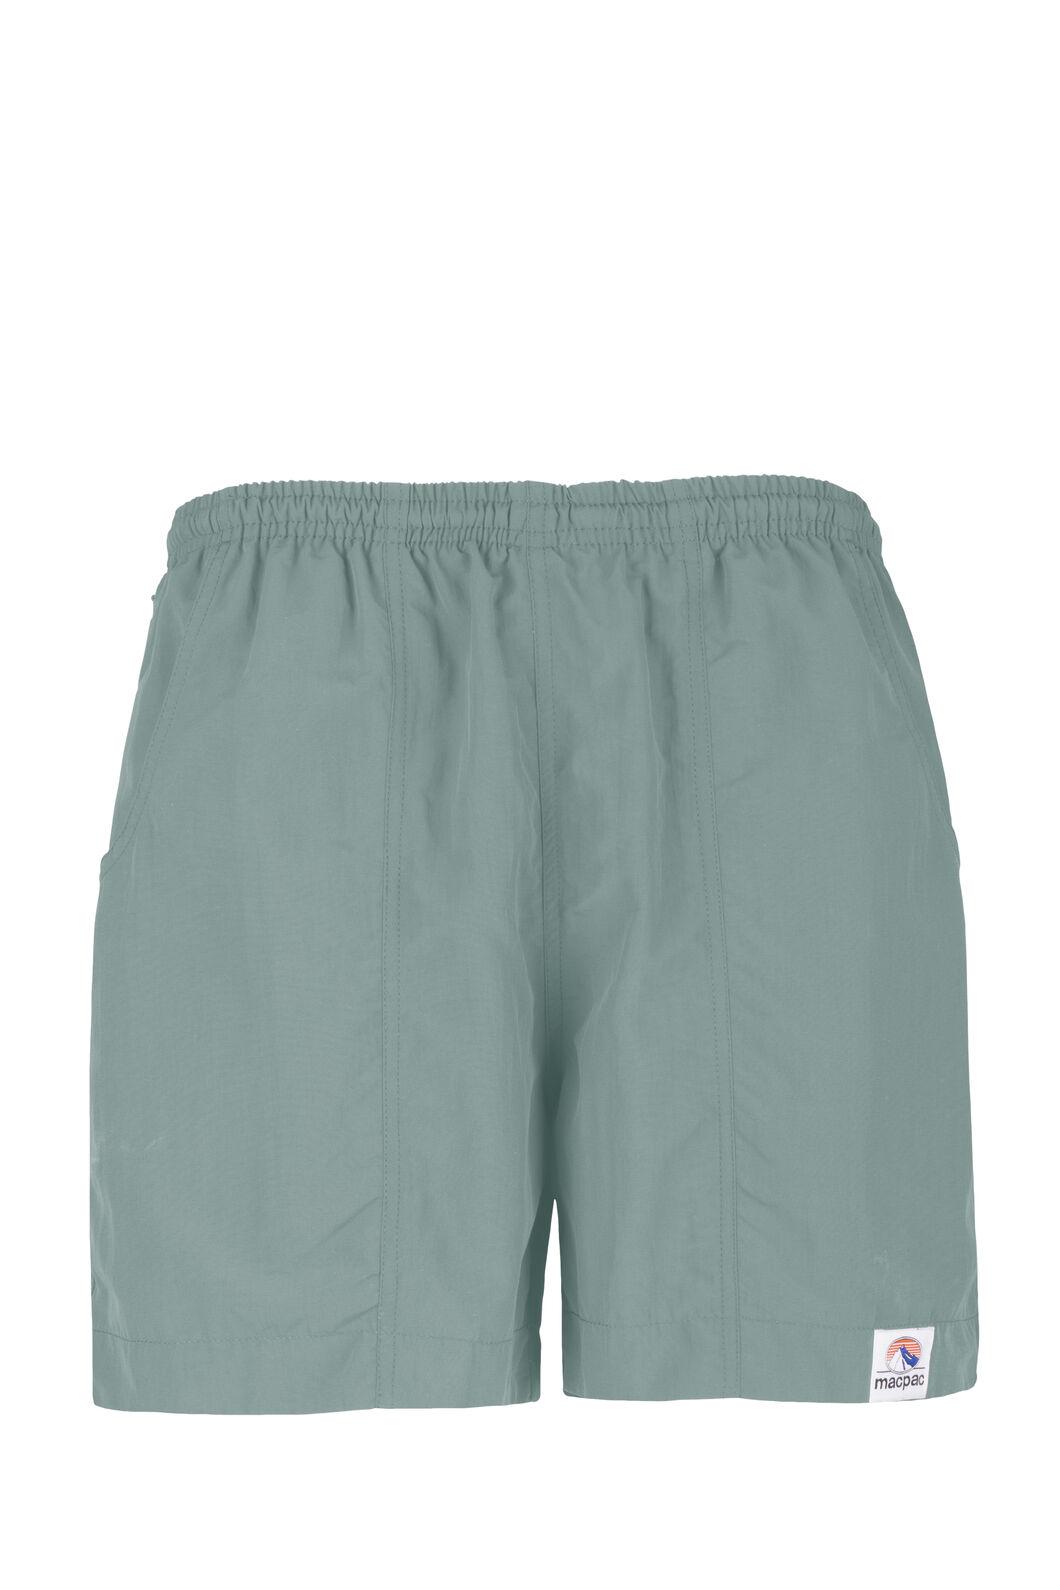 Macpac Winger Shorts — Men's, Stormy Sea, hi-res